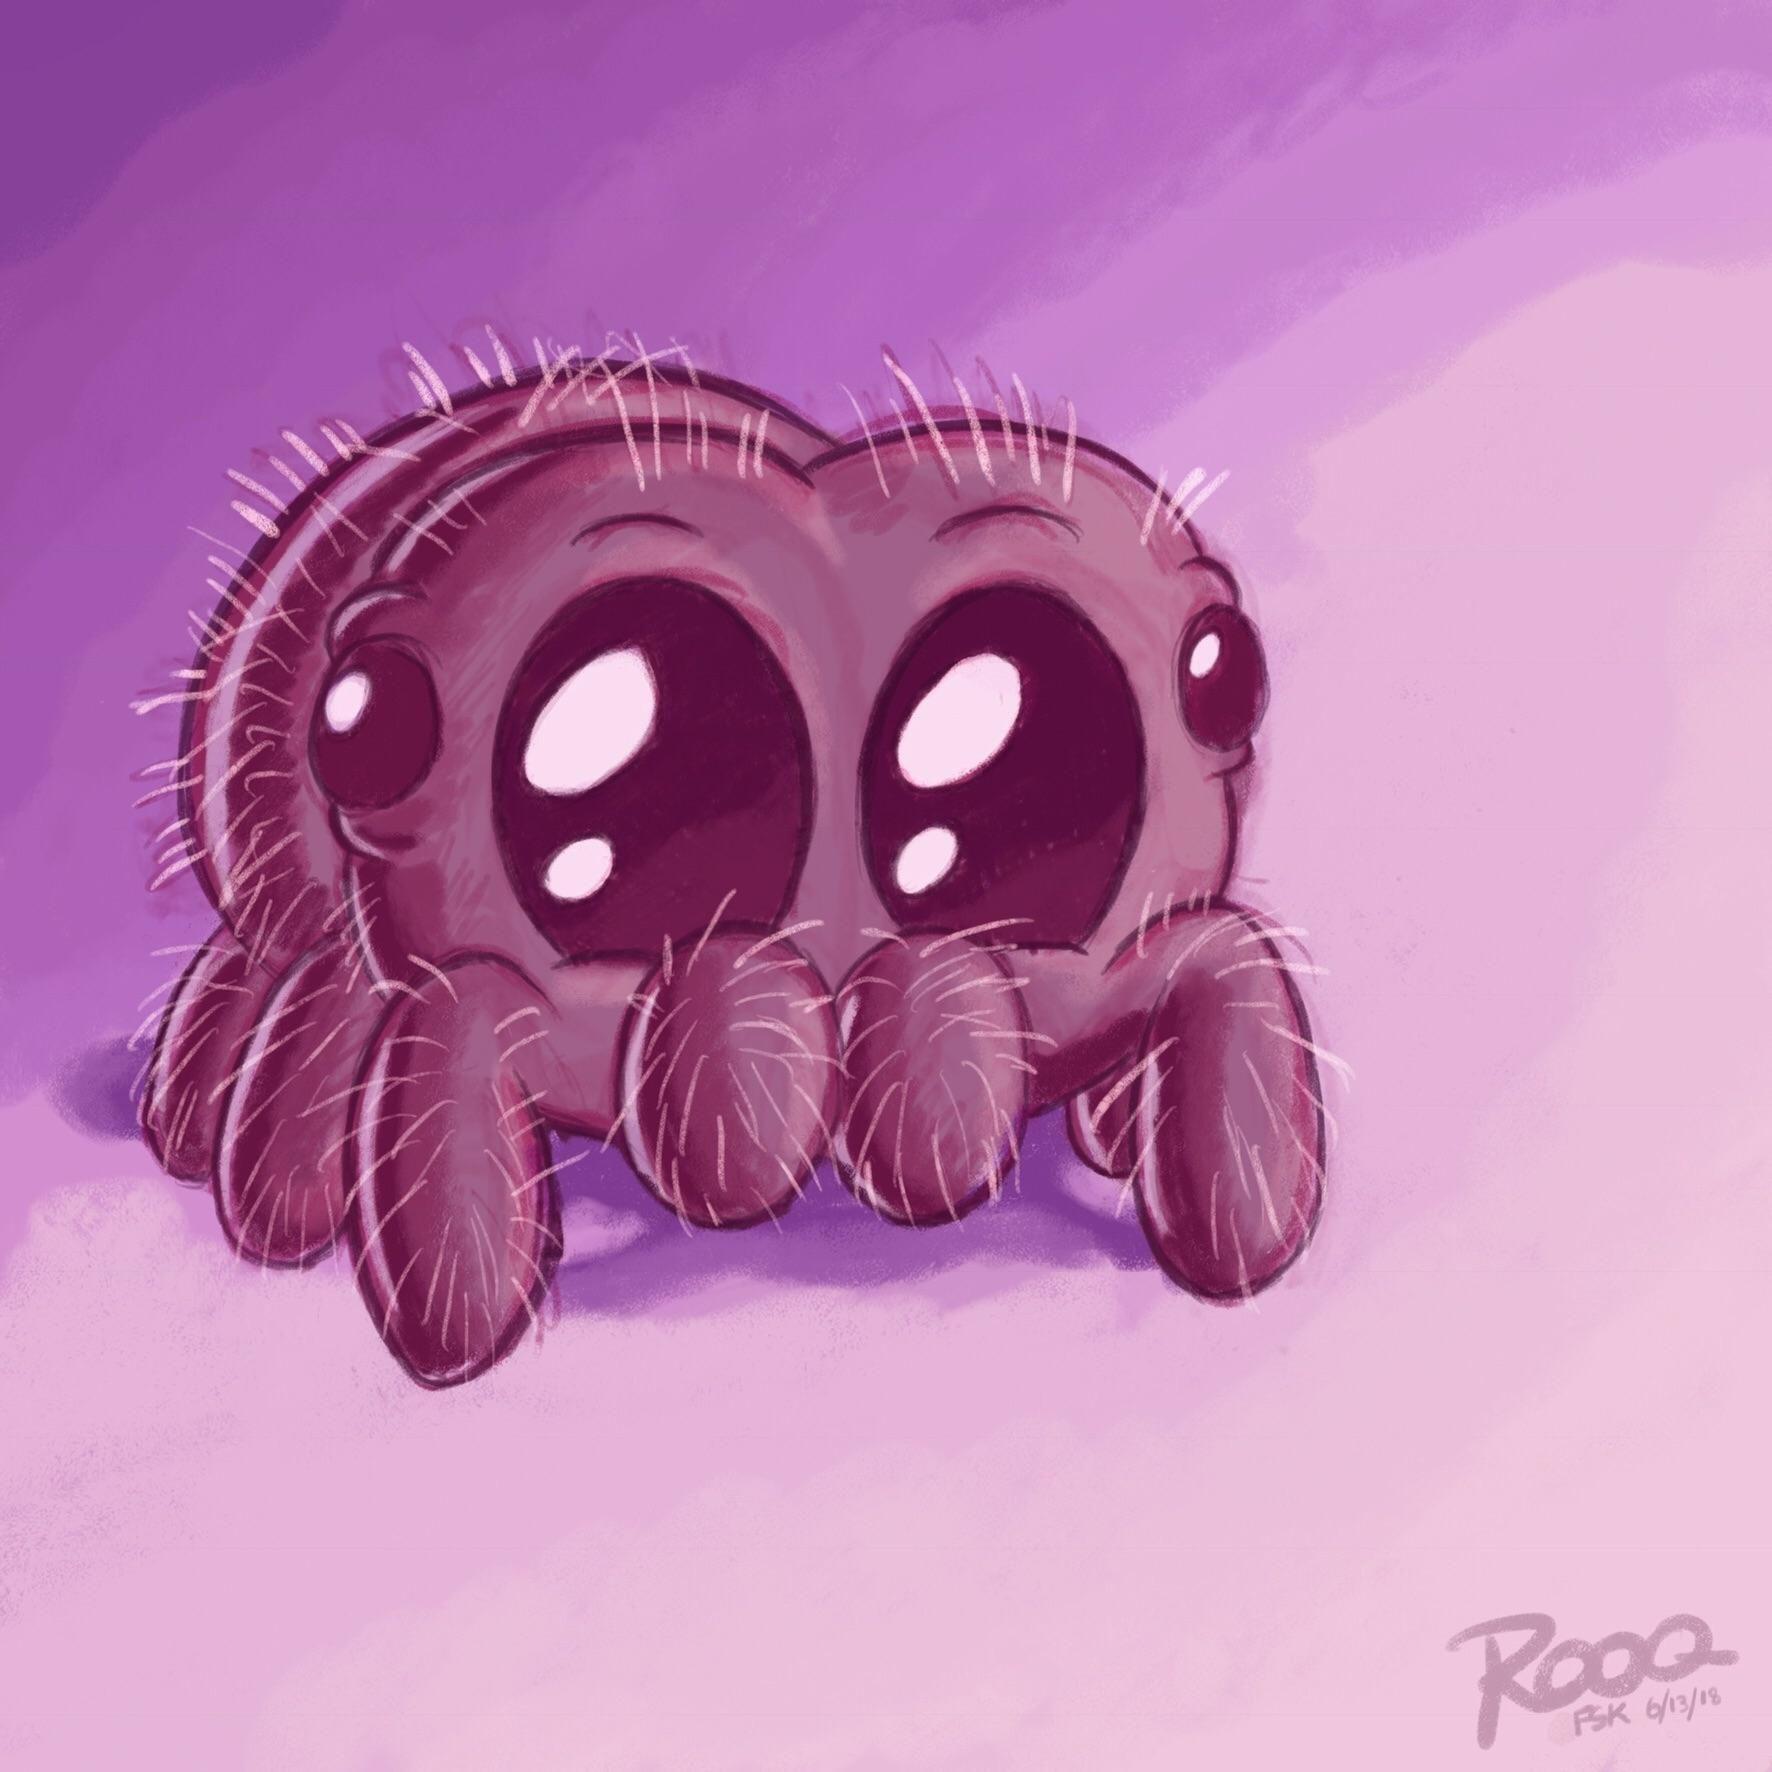 Fanart Lucas The Spider Https Ift Tt 2hn5hv1 Spider Drawing Lucas The Spider Cute Drawings